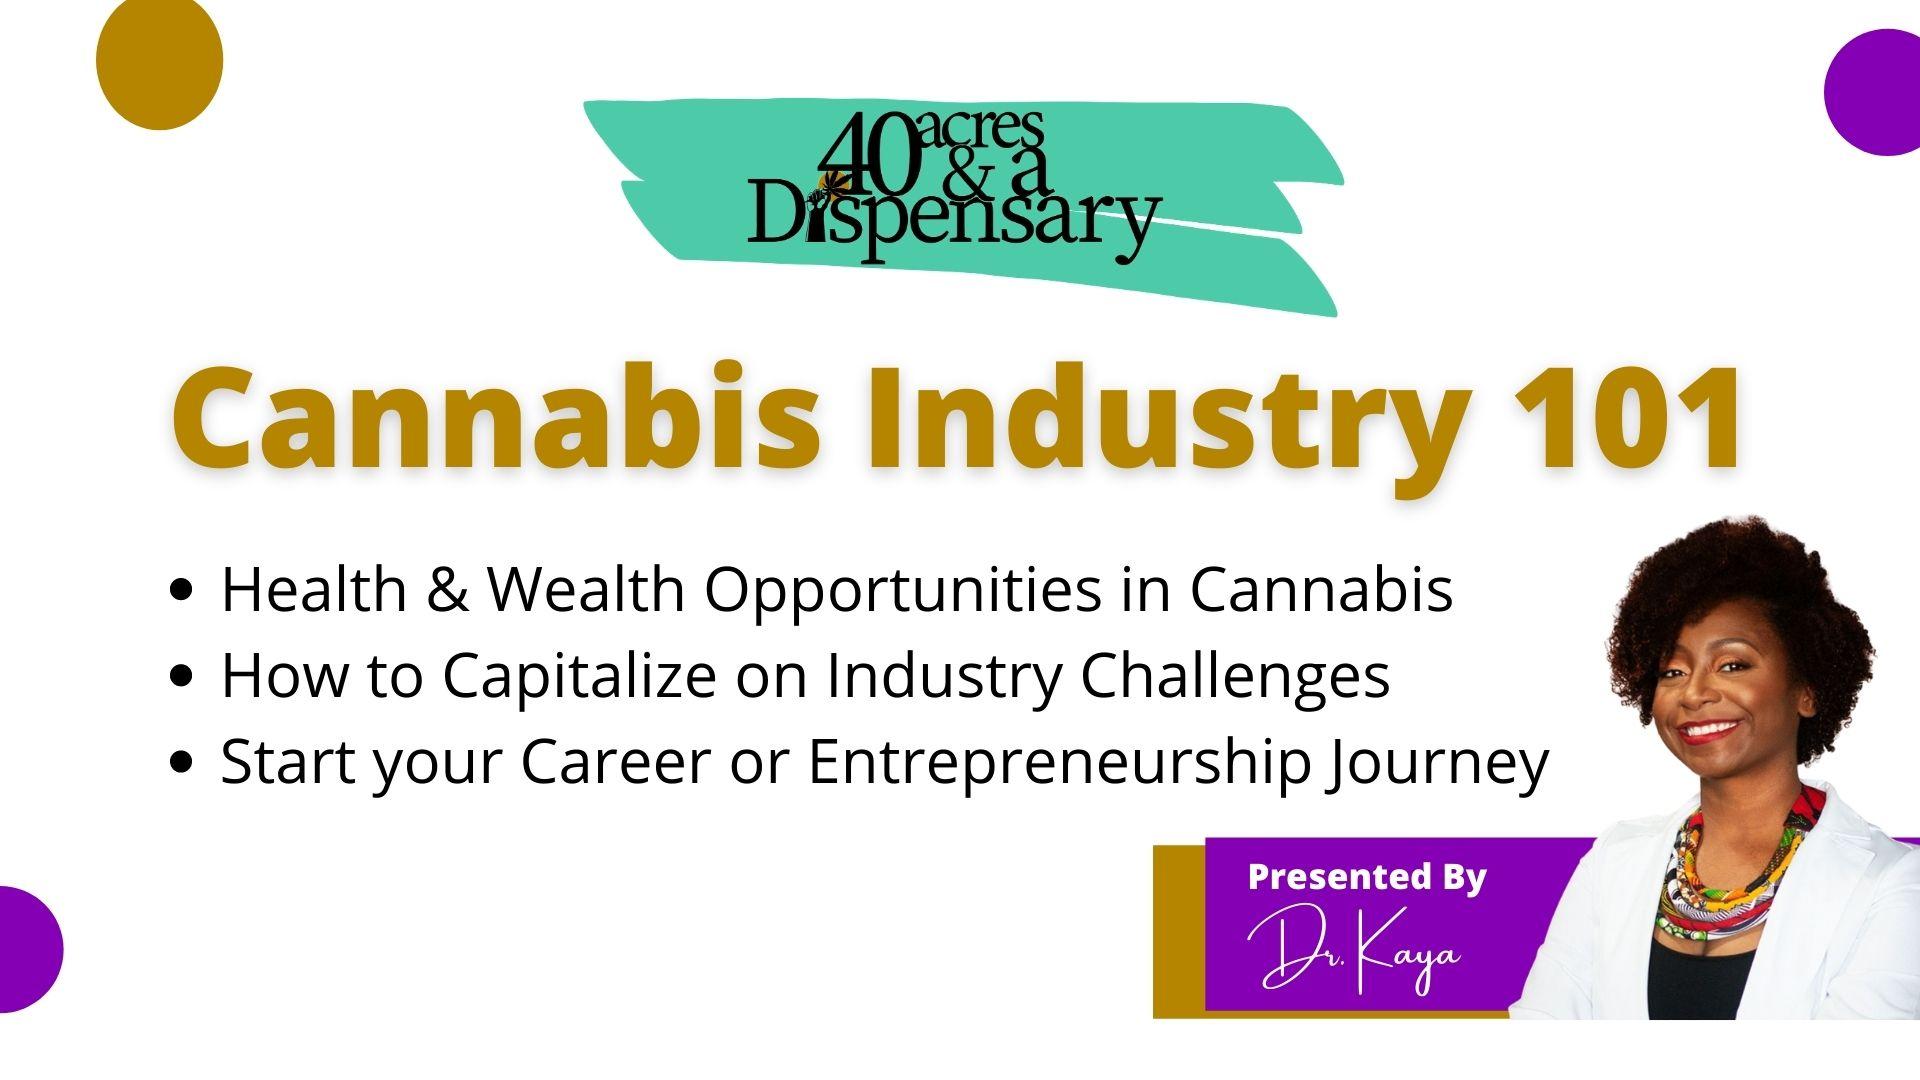 40 Acres And A Dispensary: Cannabis Industry 101 Webinar